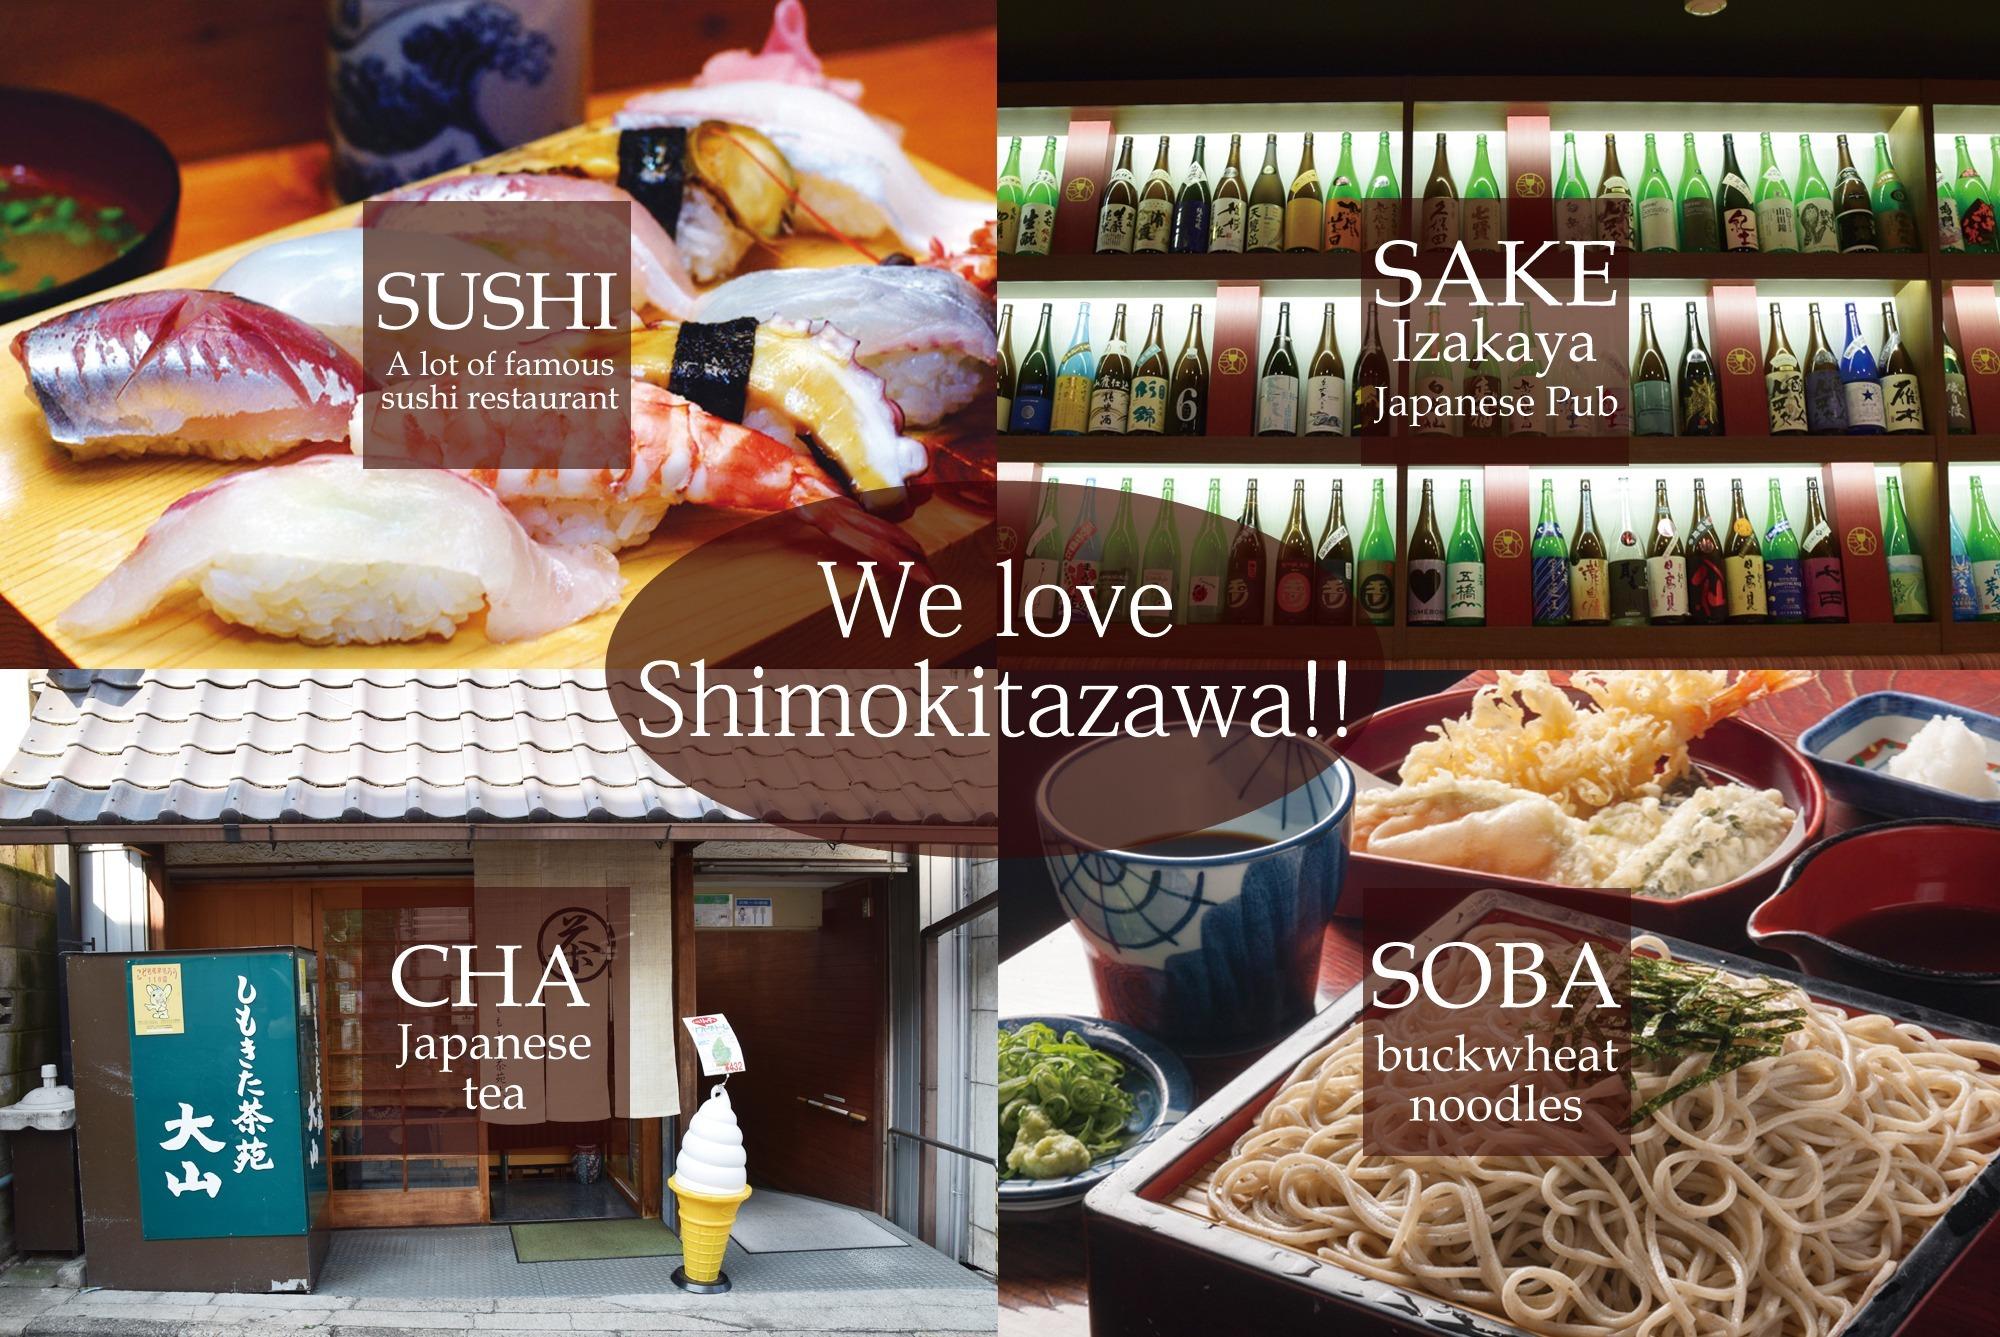 Authentic soba restaurants, sushi restaurants, tea, Japanese sake, fresh sashimi, izakayas, bars and many more.